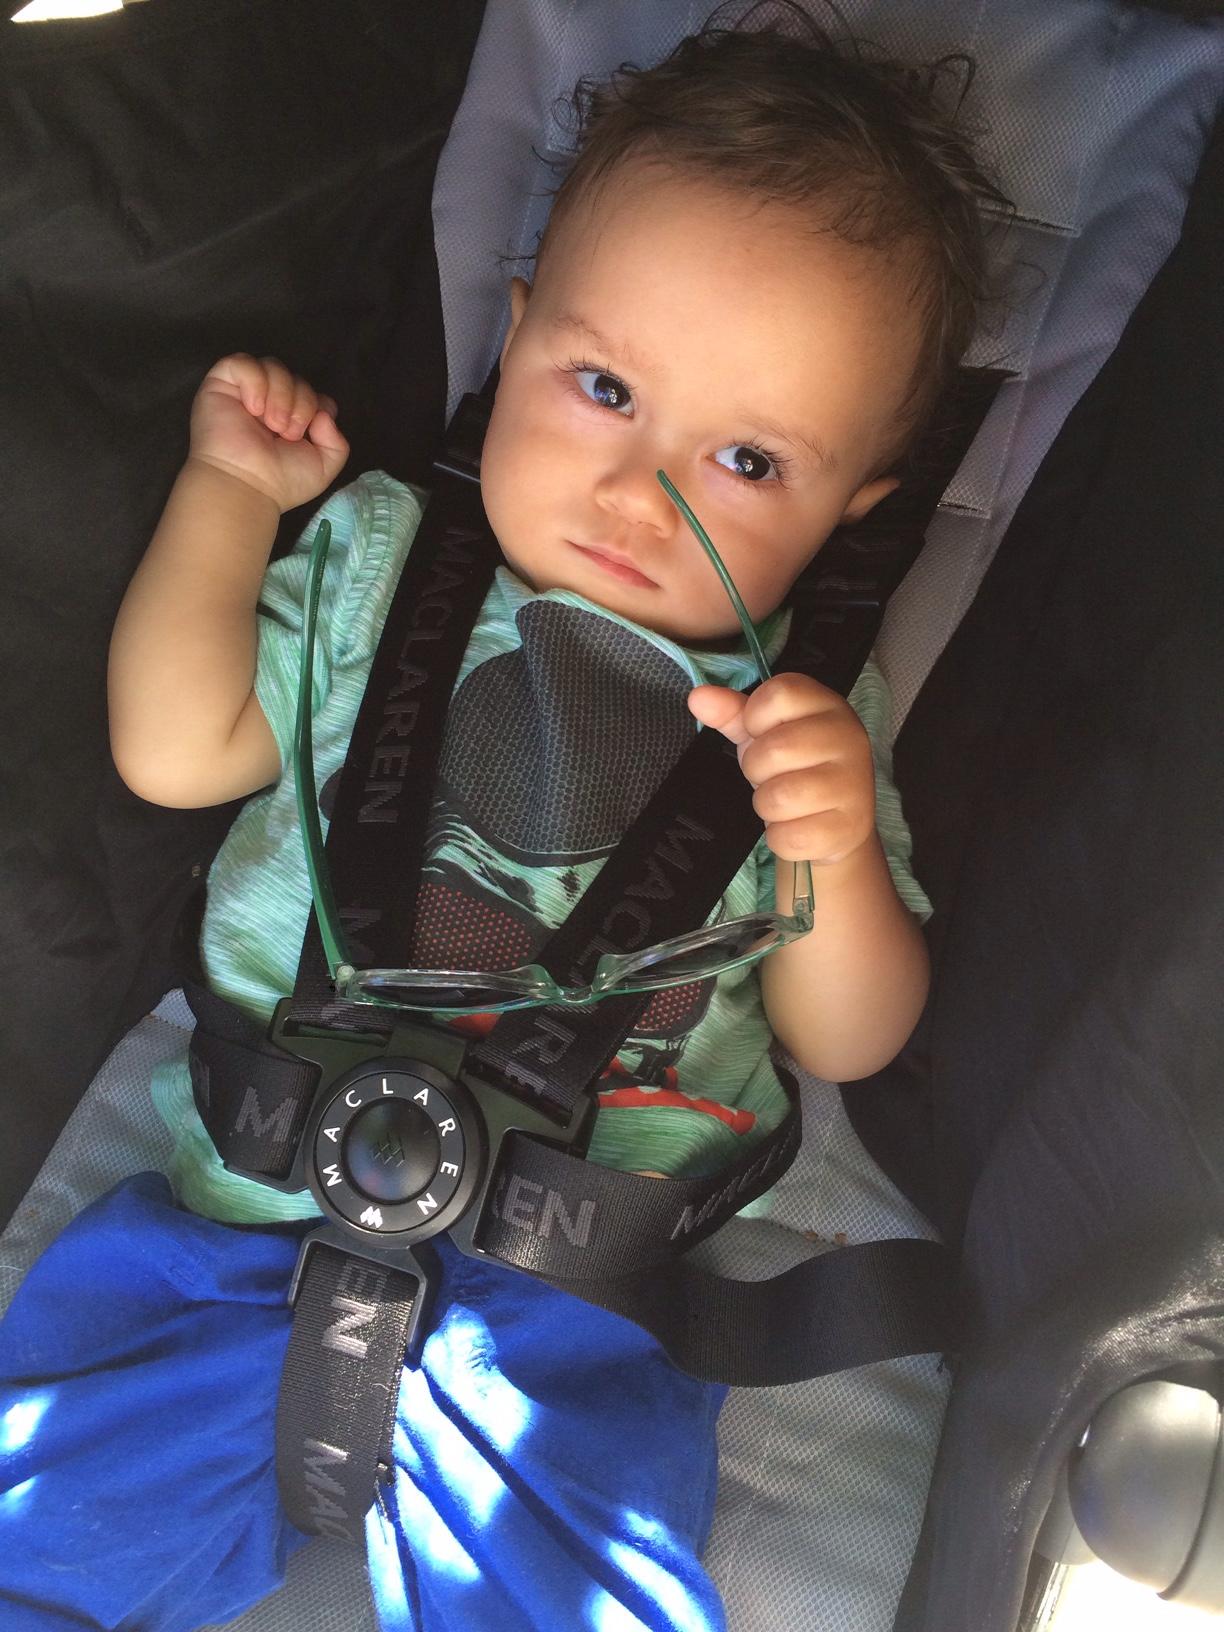 Grumpy holding sunglasses